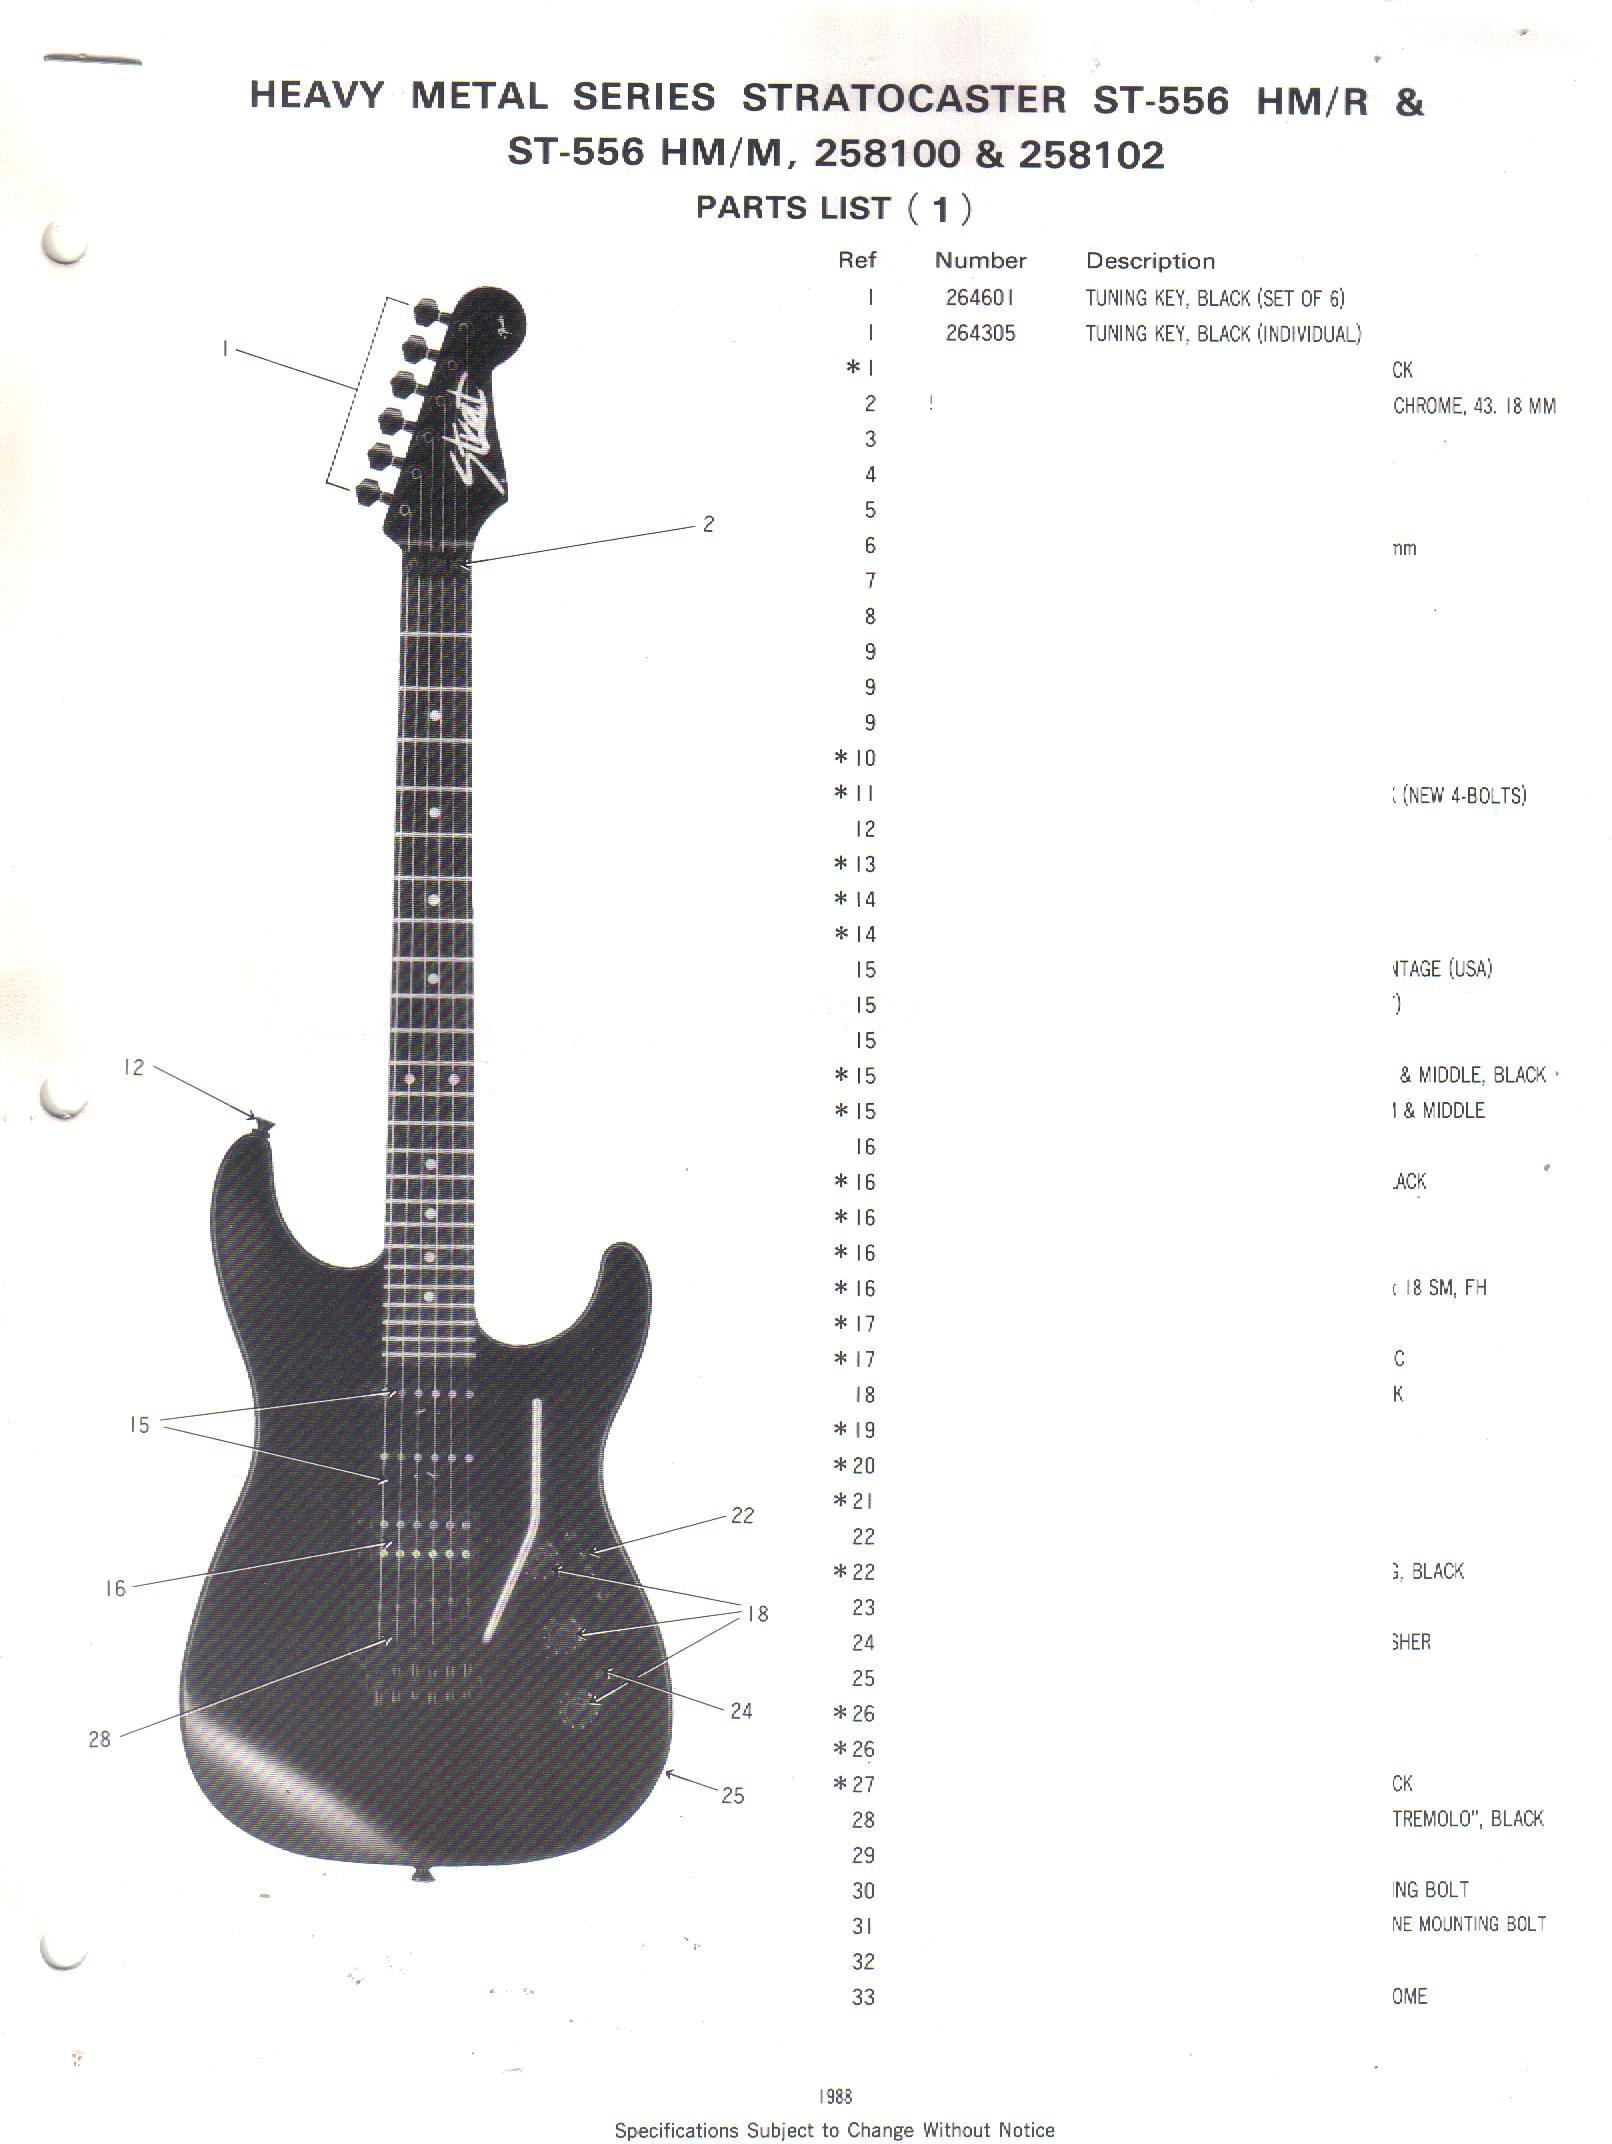 fender heavy metal series stratocaster st 556 hm r st 556 hm m rh amazon com Fender 5-Way Switch Wiring Strat Humbucker Wiring-Diagram